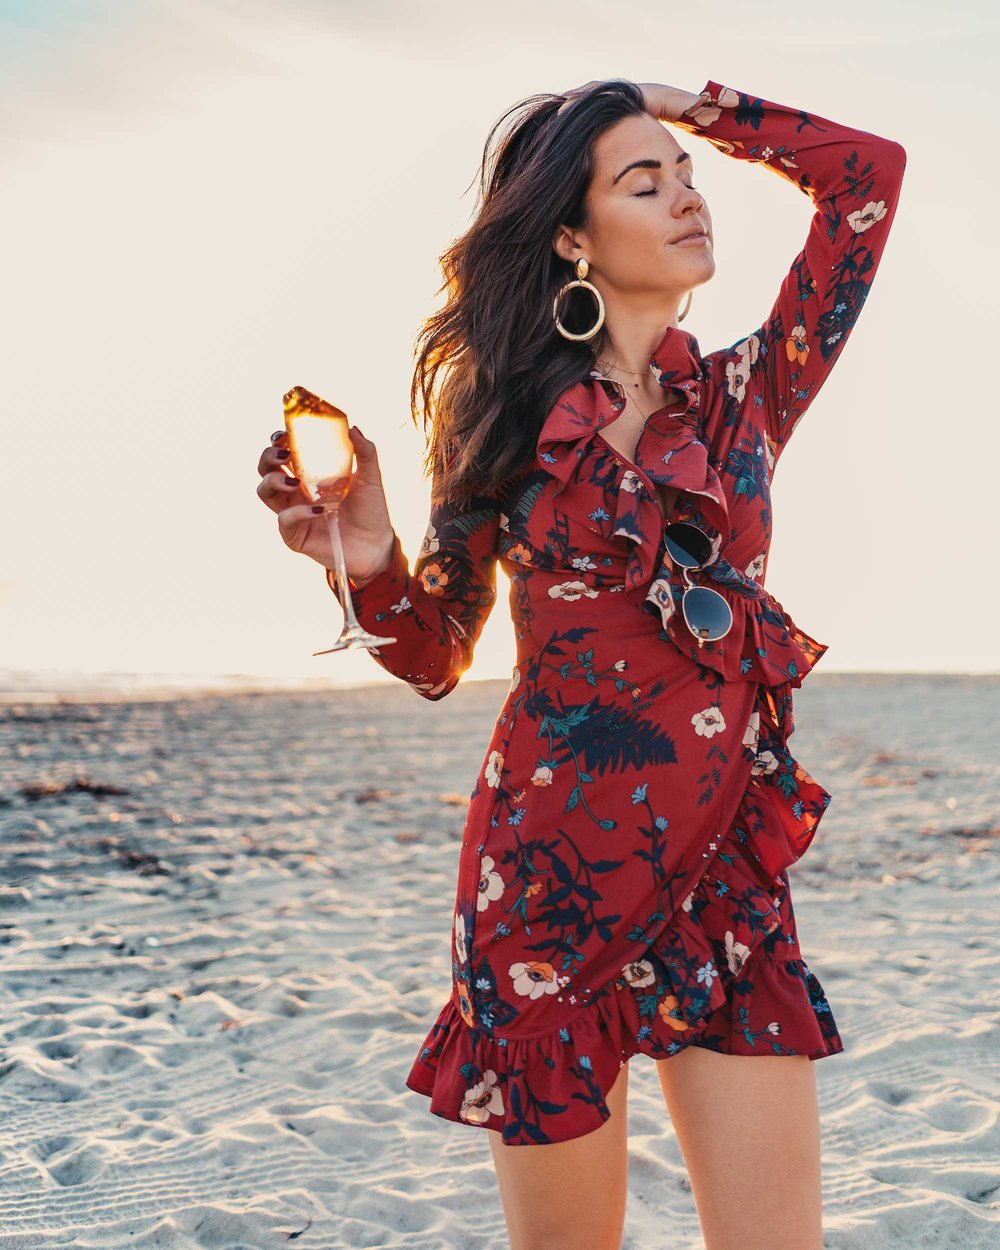 BURGUNDY-FLORAL-FRILL-WRAP-MINI-DRESS-Newport-Beach-California-Summer-Dress-6.jpg